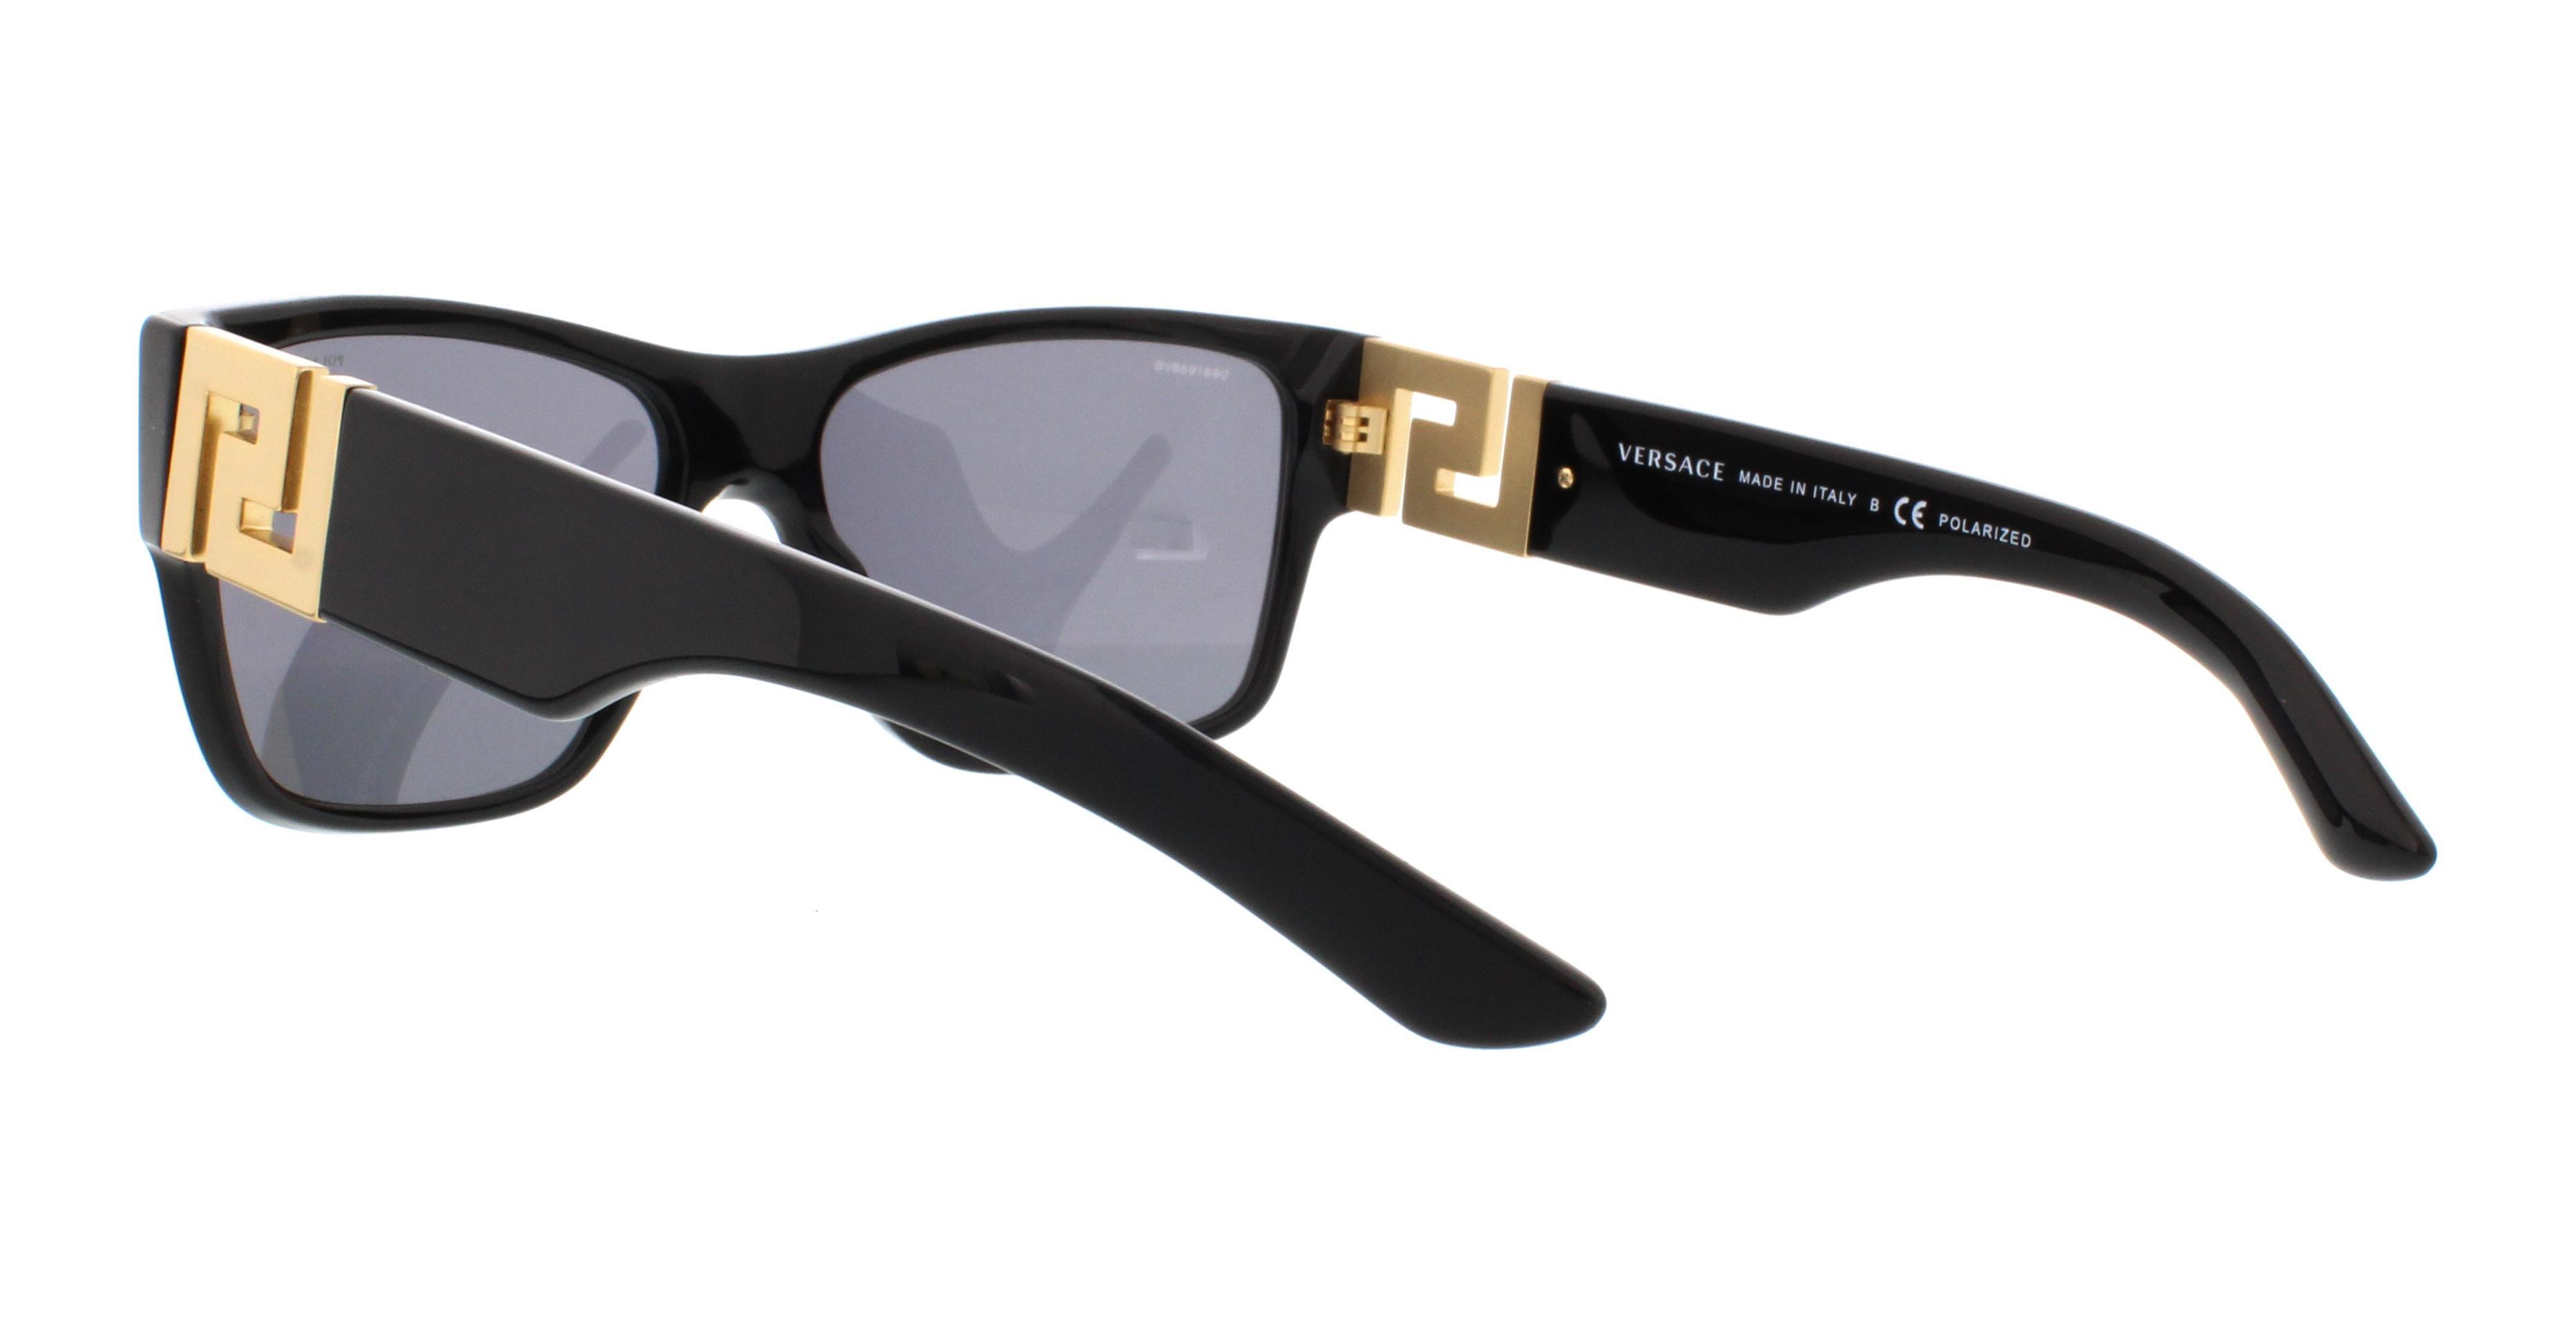 2a0c4f00a1 Versace Polarized Sunglasses Ebay - Bitterroot Public Library